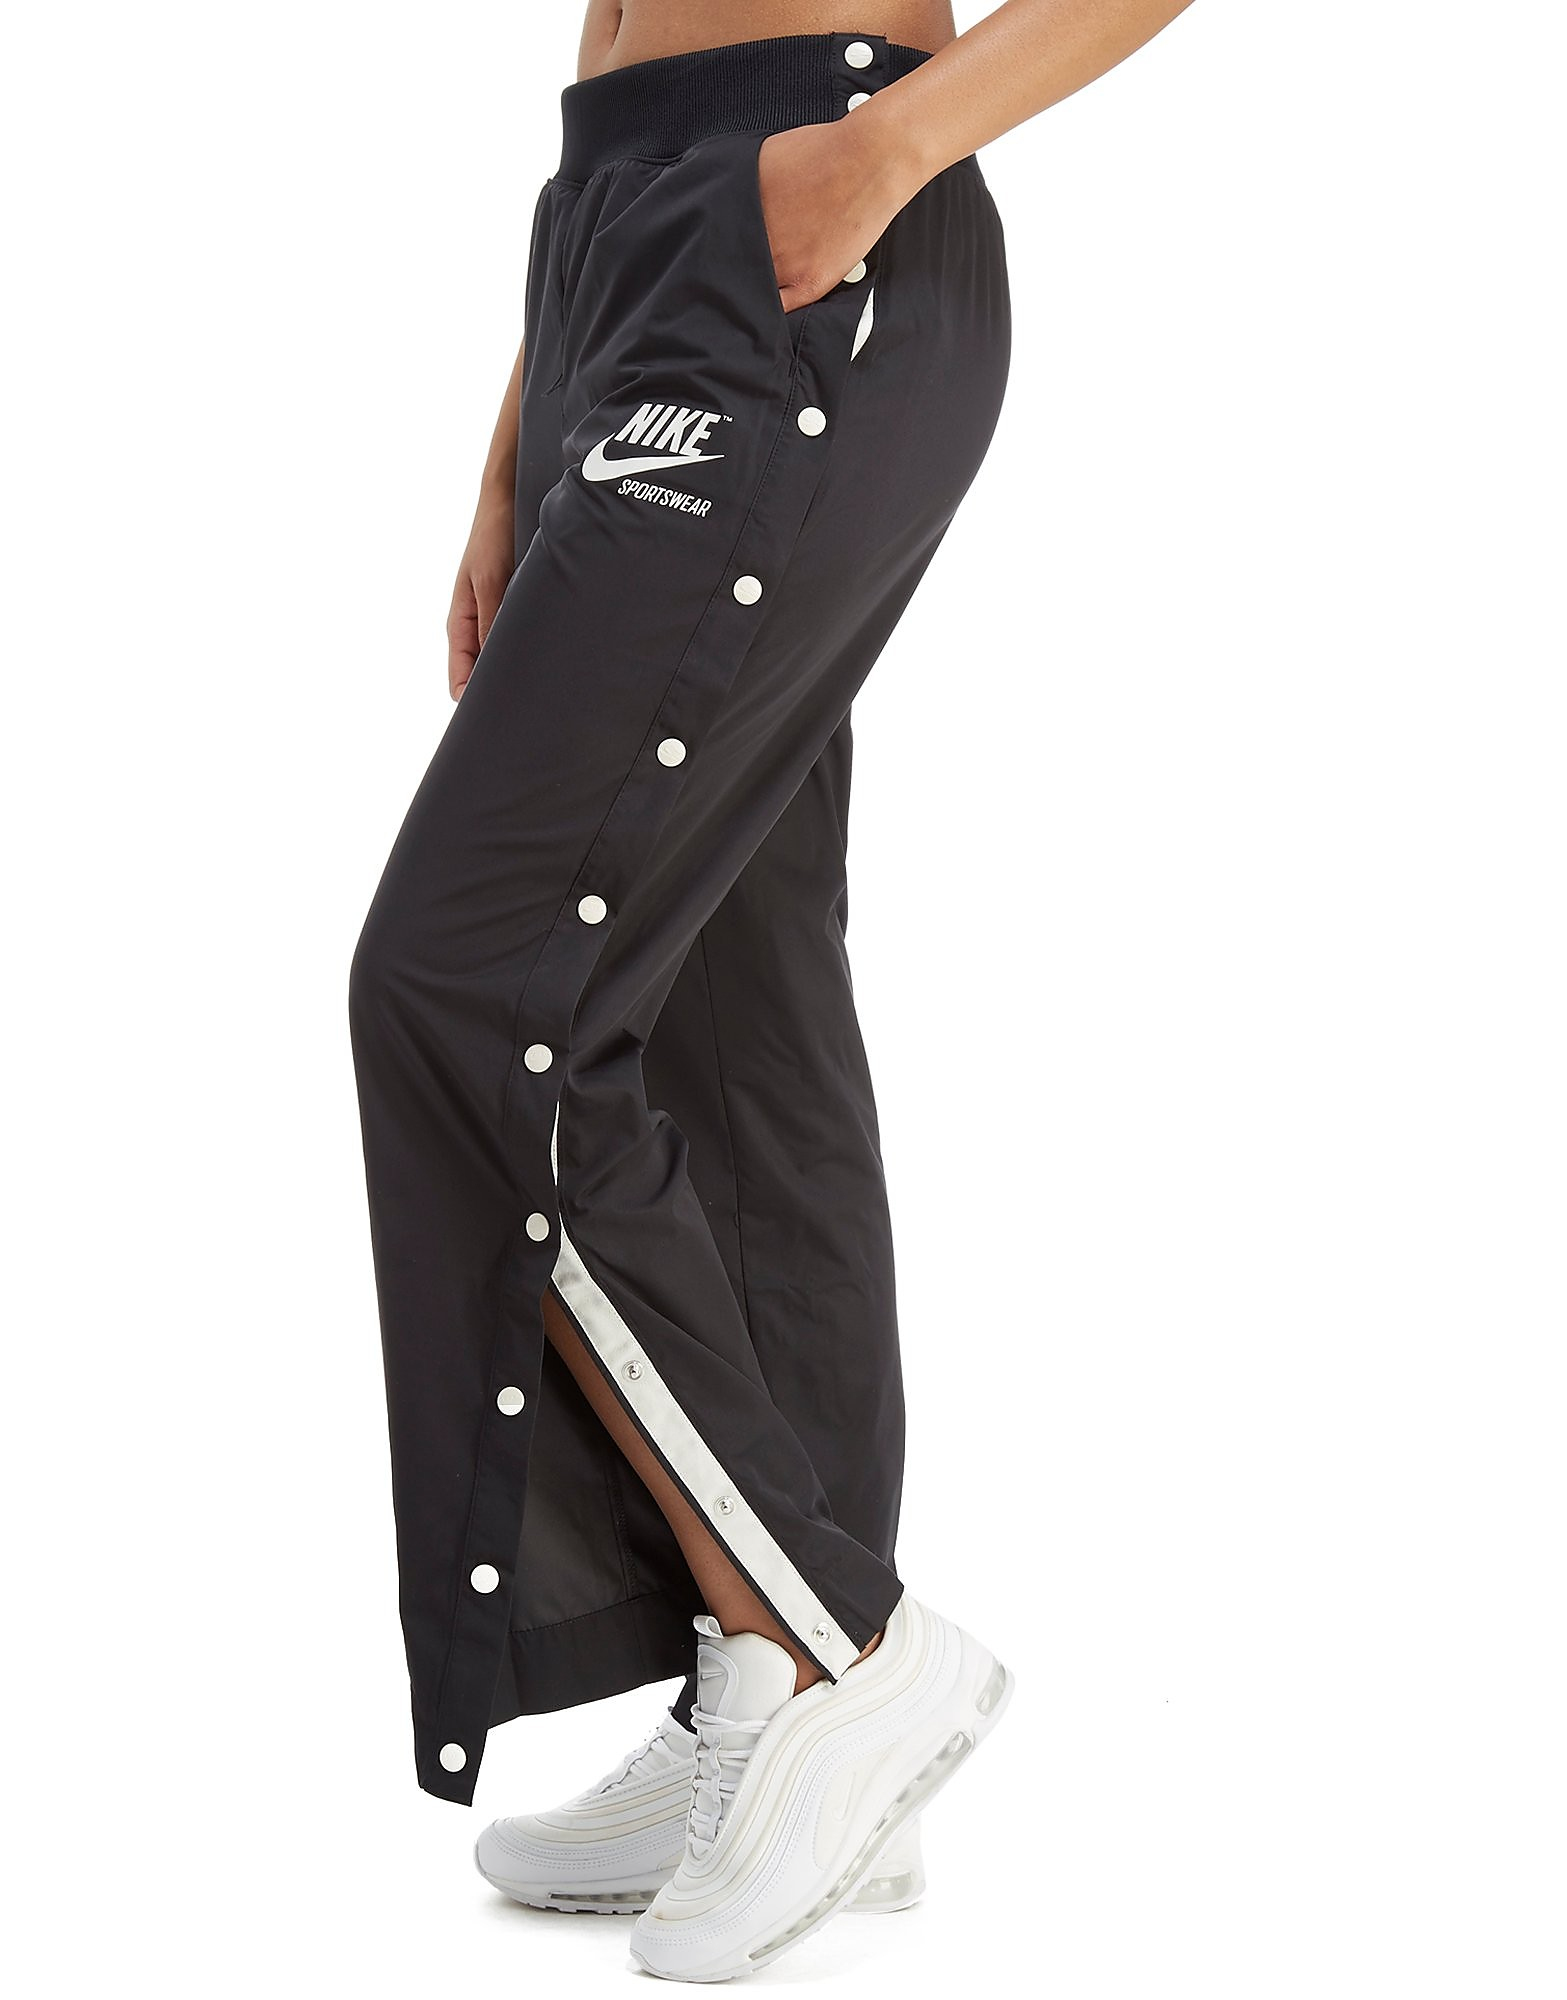 Nike Archive Snap Pants